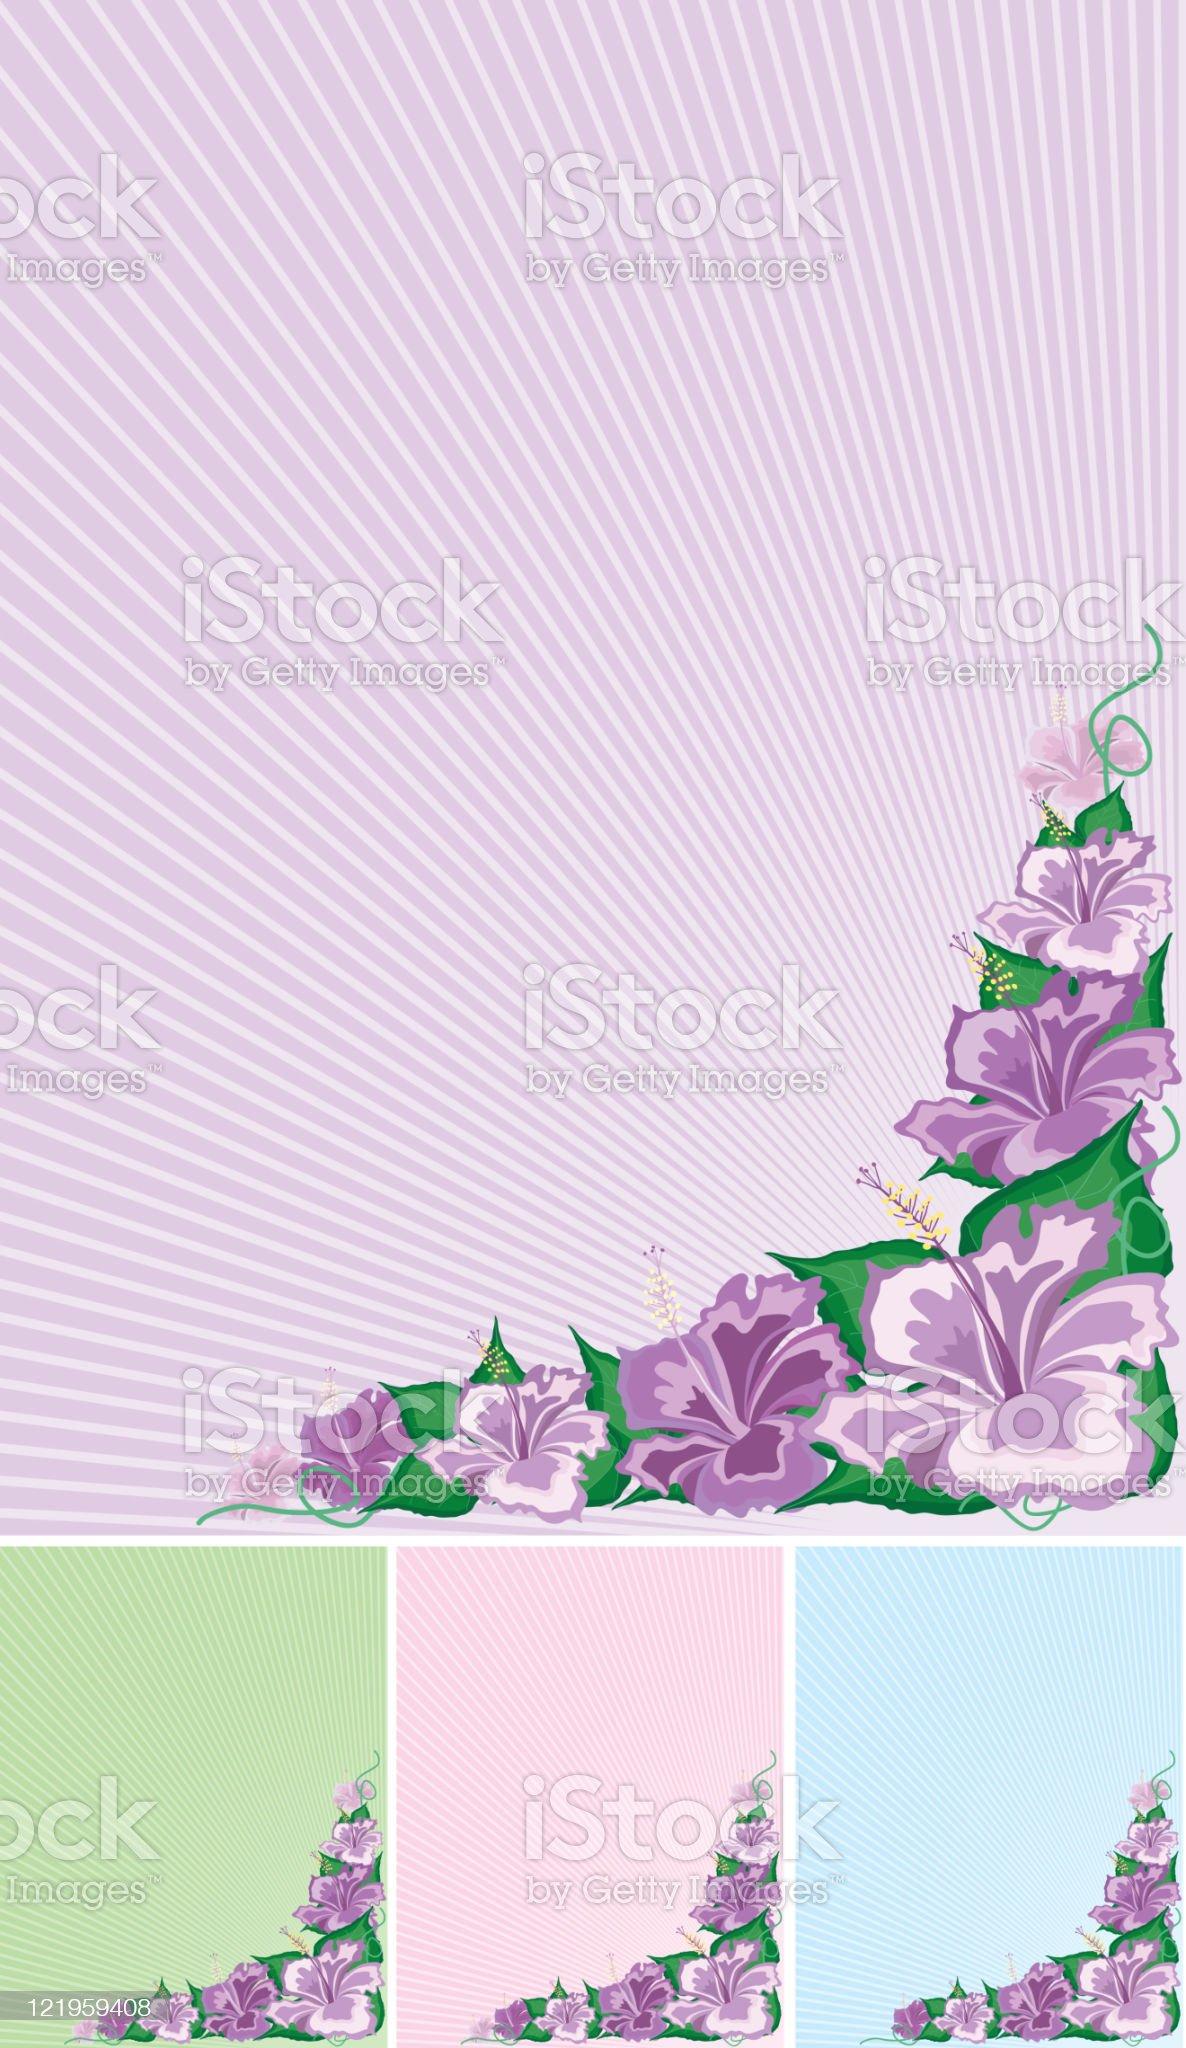 Hibiscus design elements royalty-free stock vector art